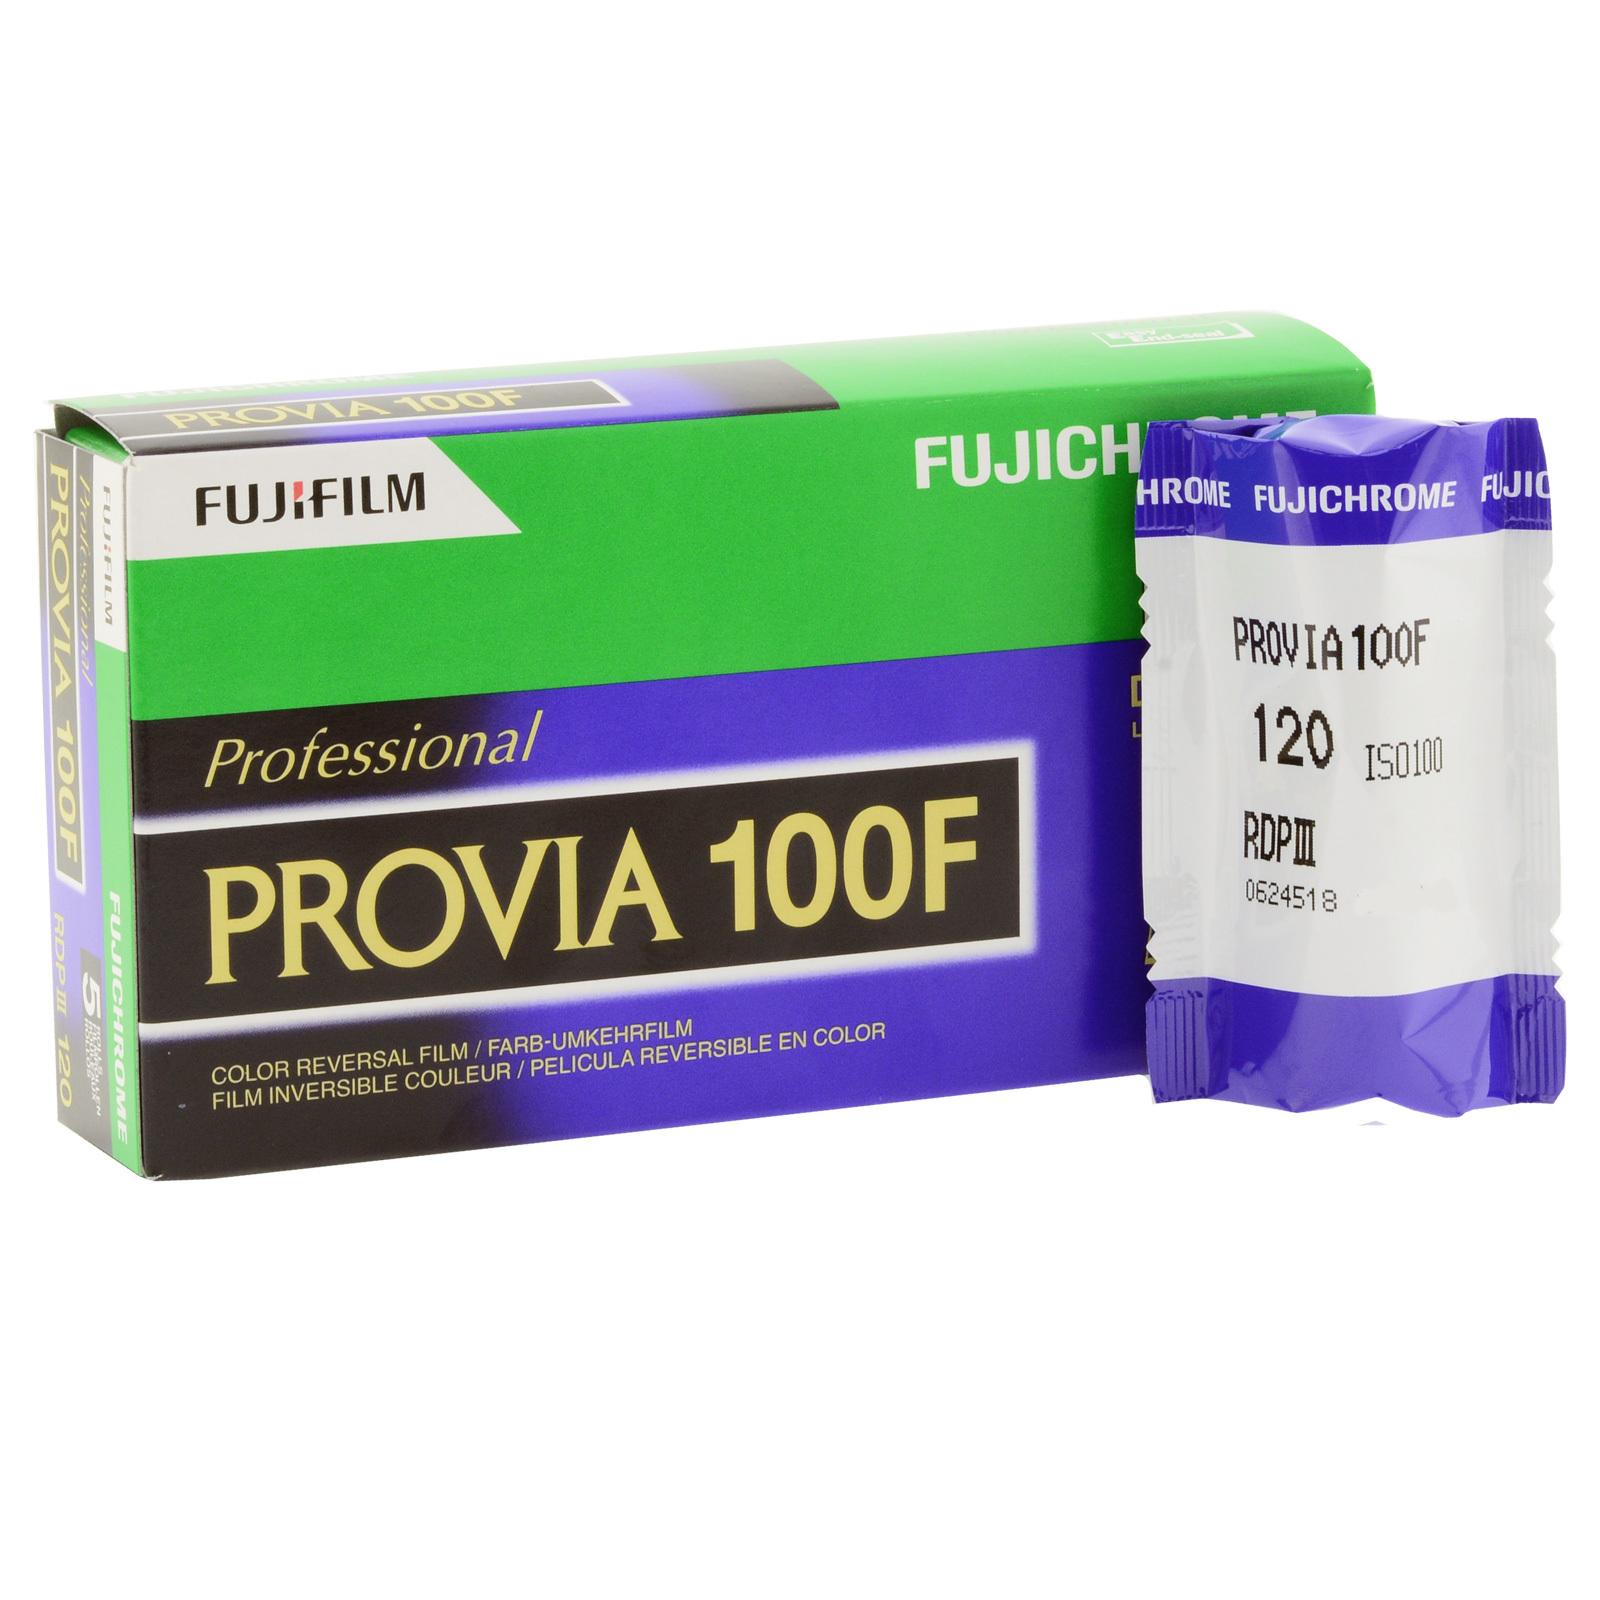 Фотопленка Fujifilm Provia 100F/120